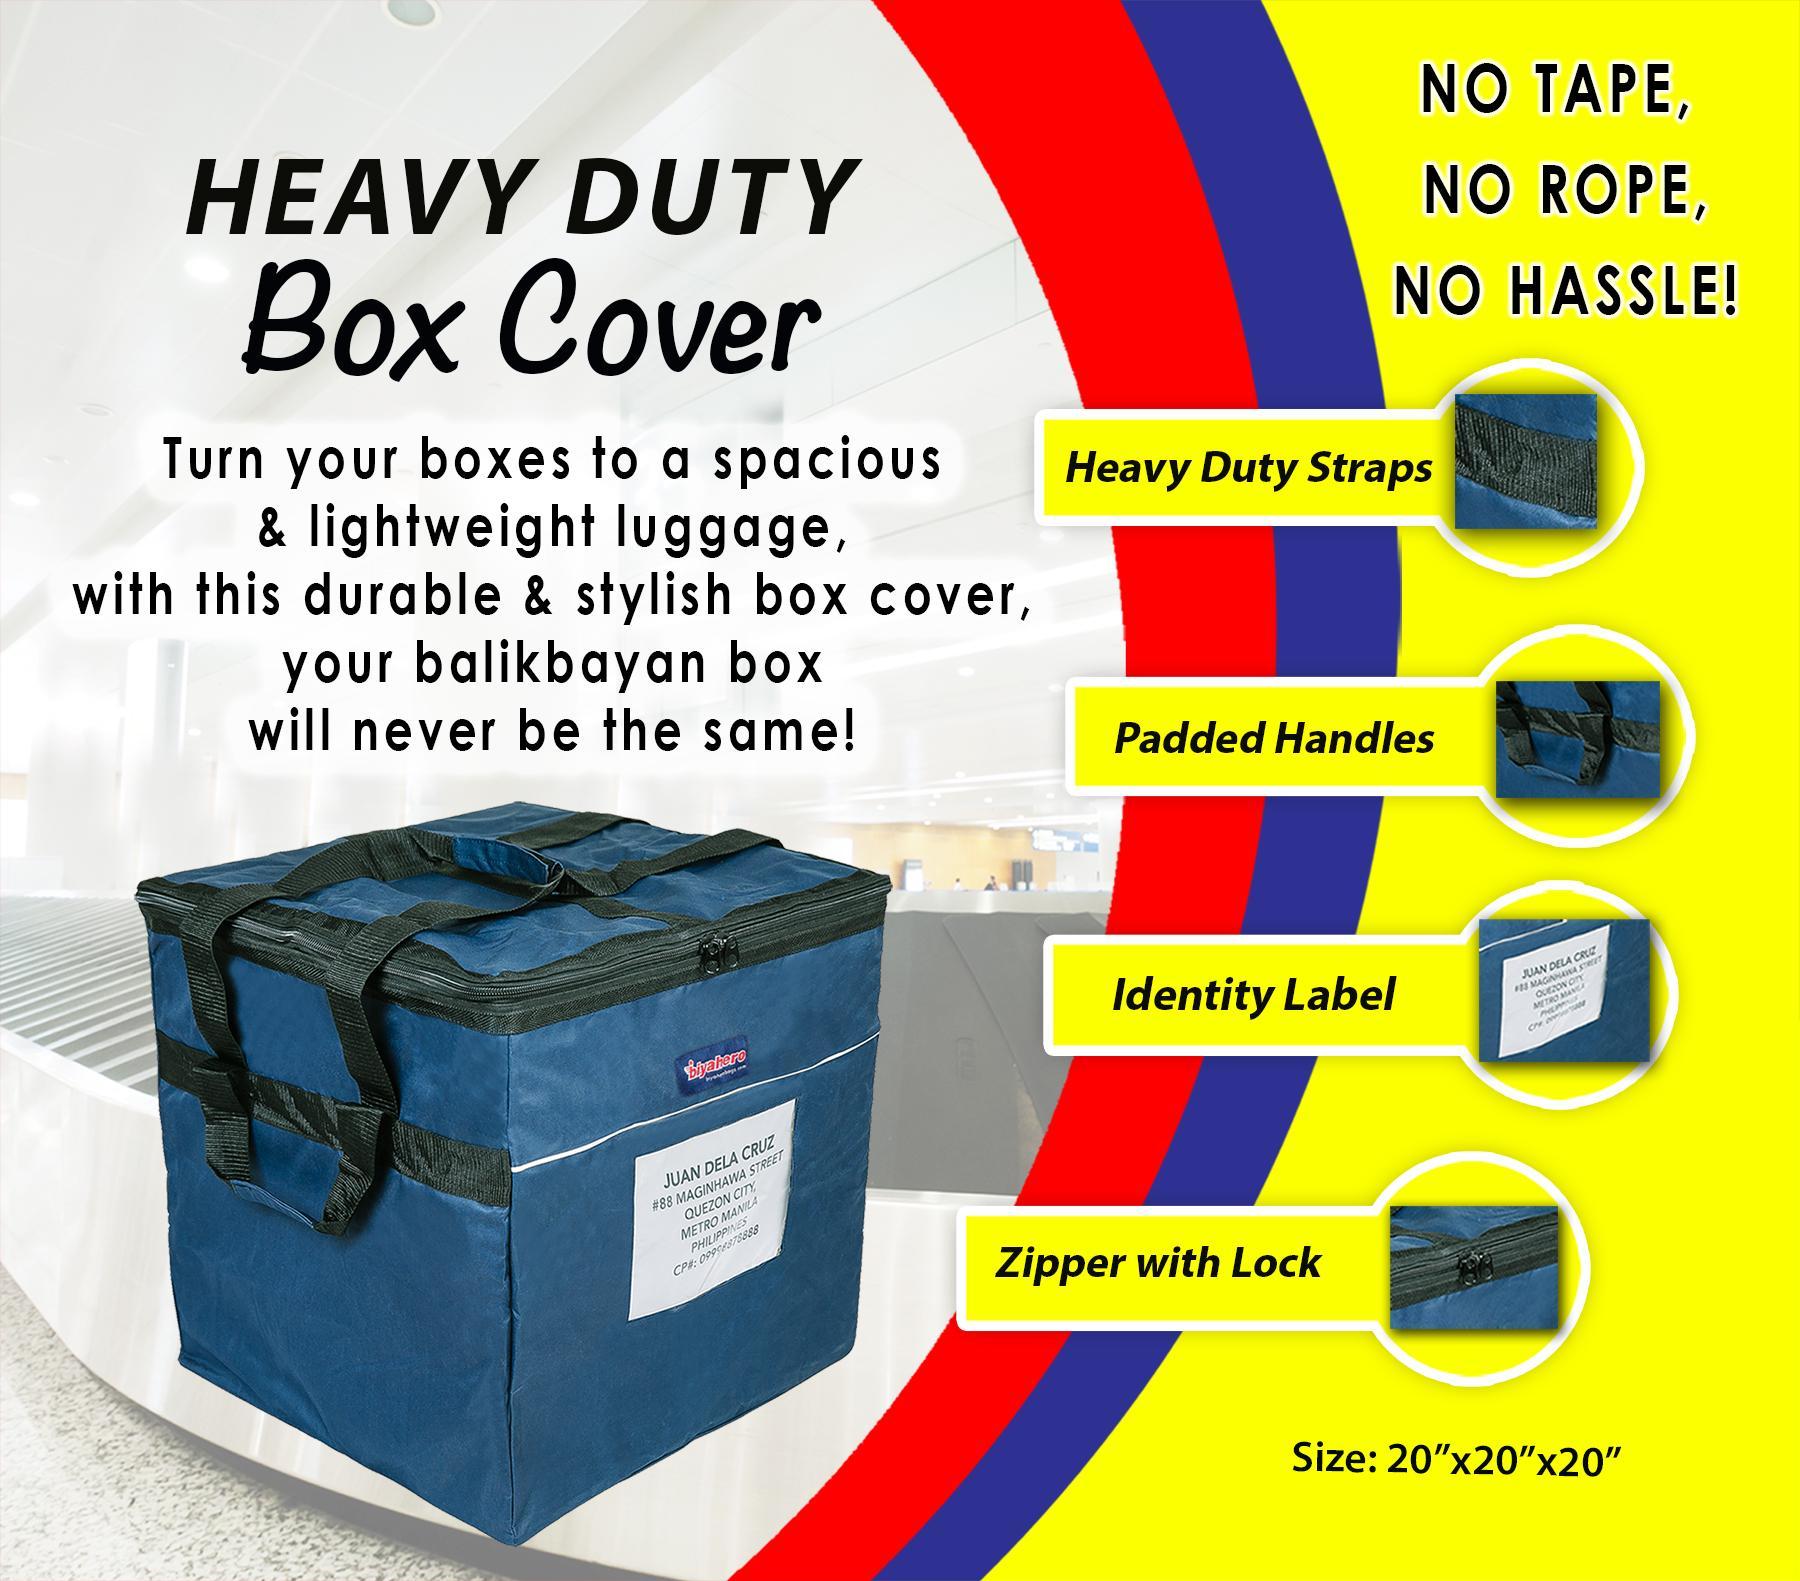 Box Cover Heavy Duty.jpg